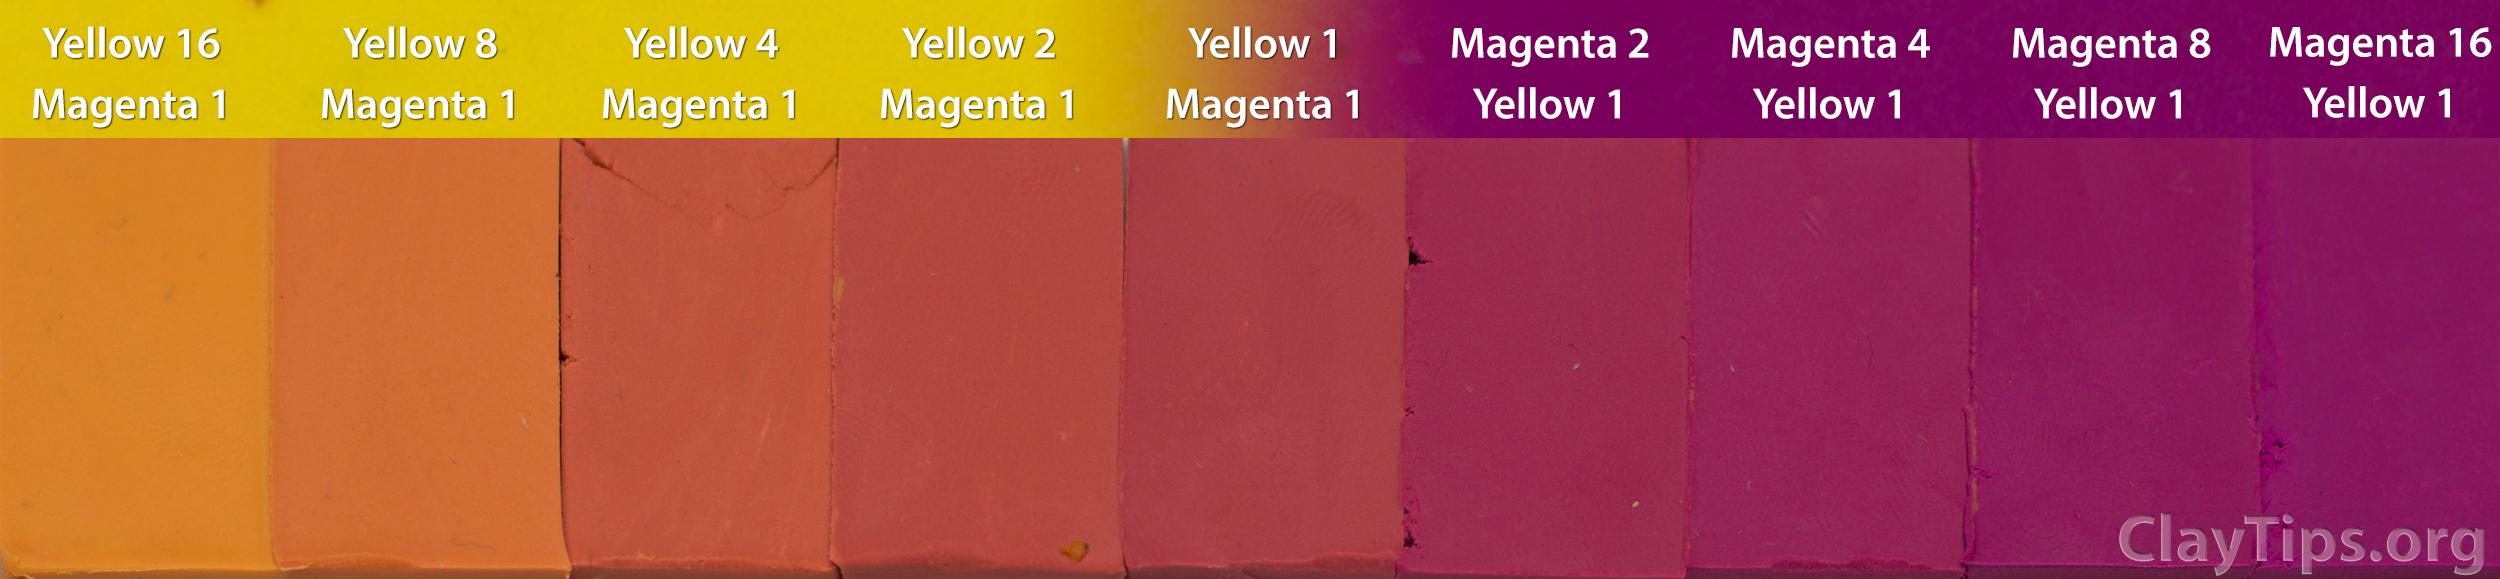 Yellow and Magenta Plasticine